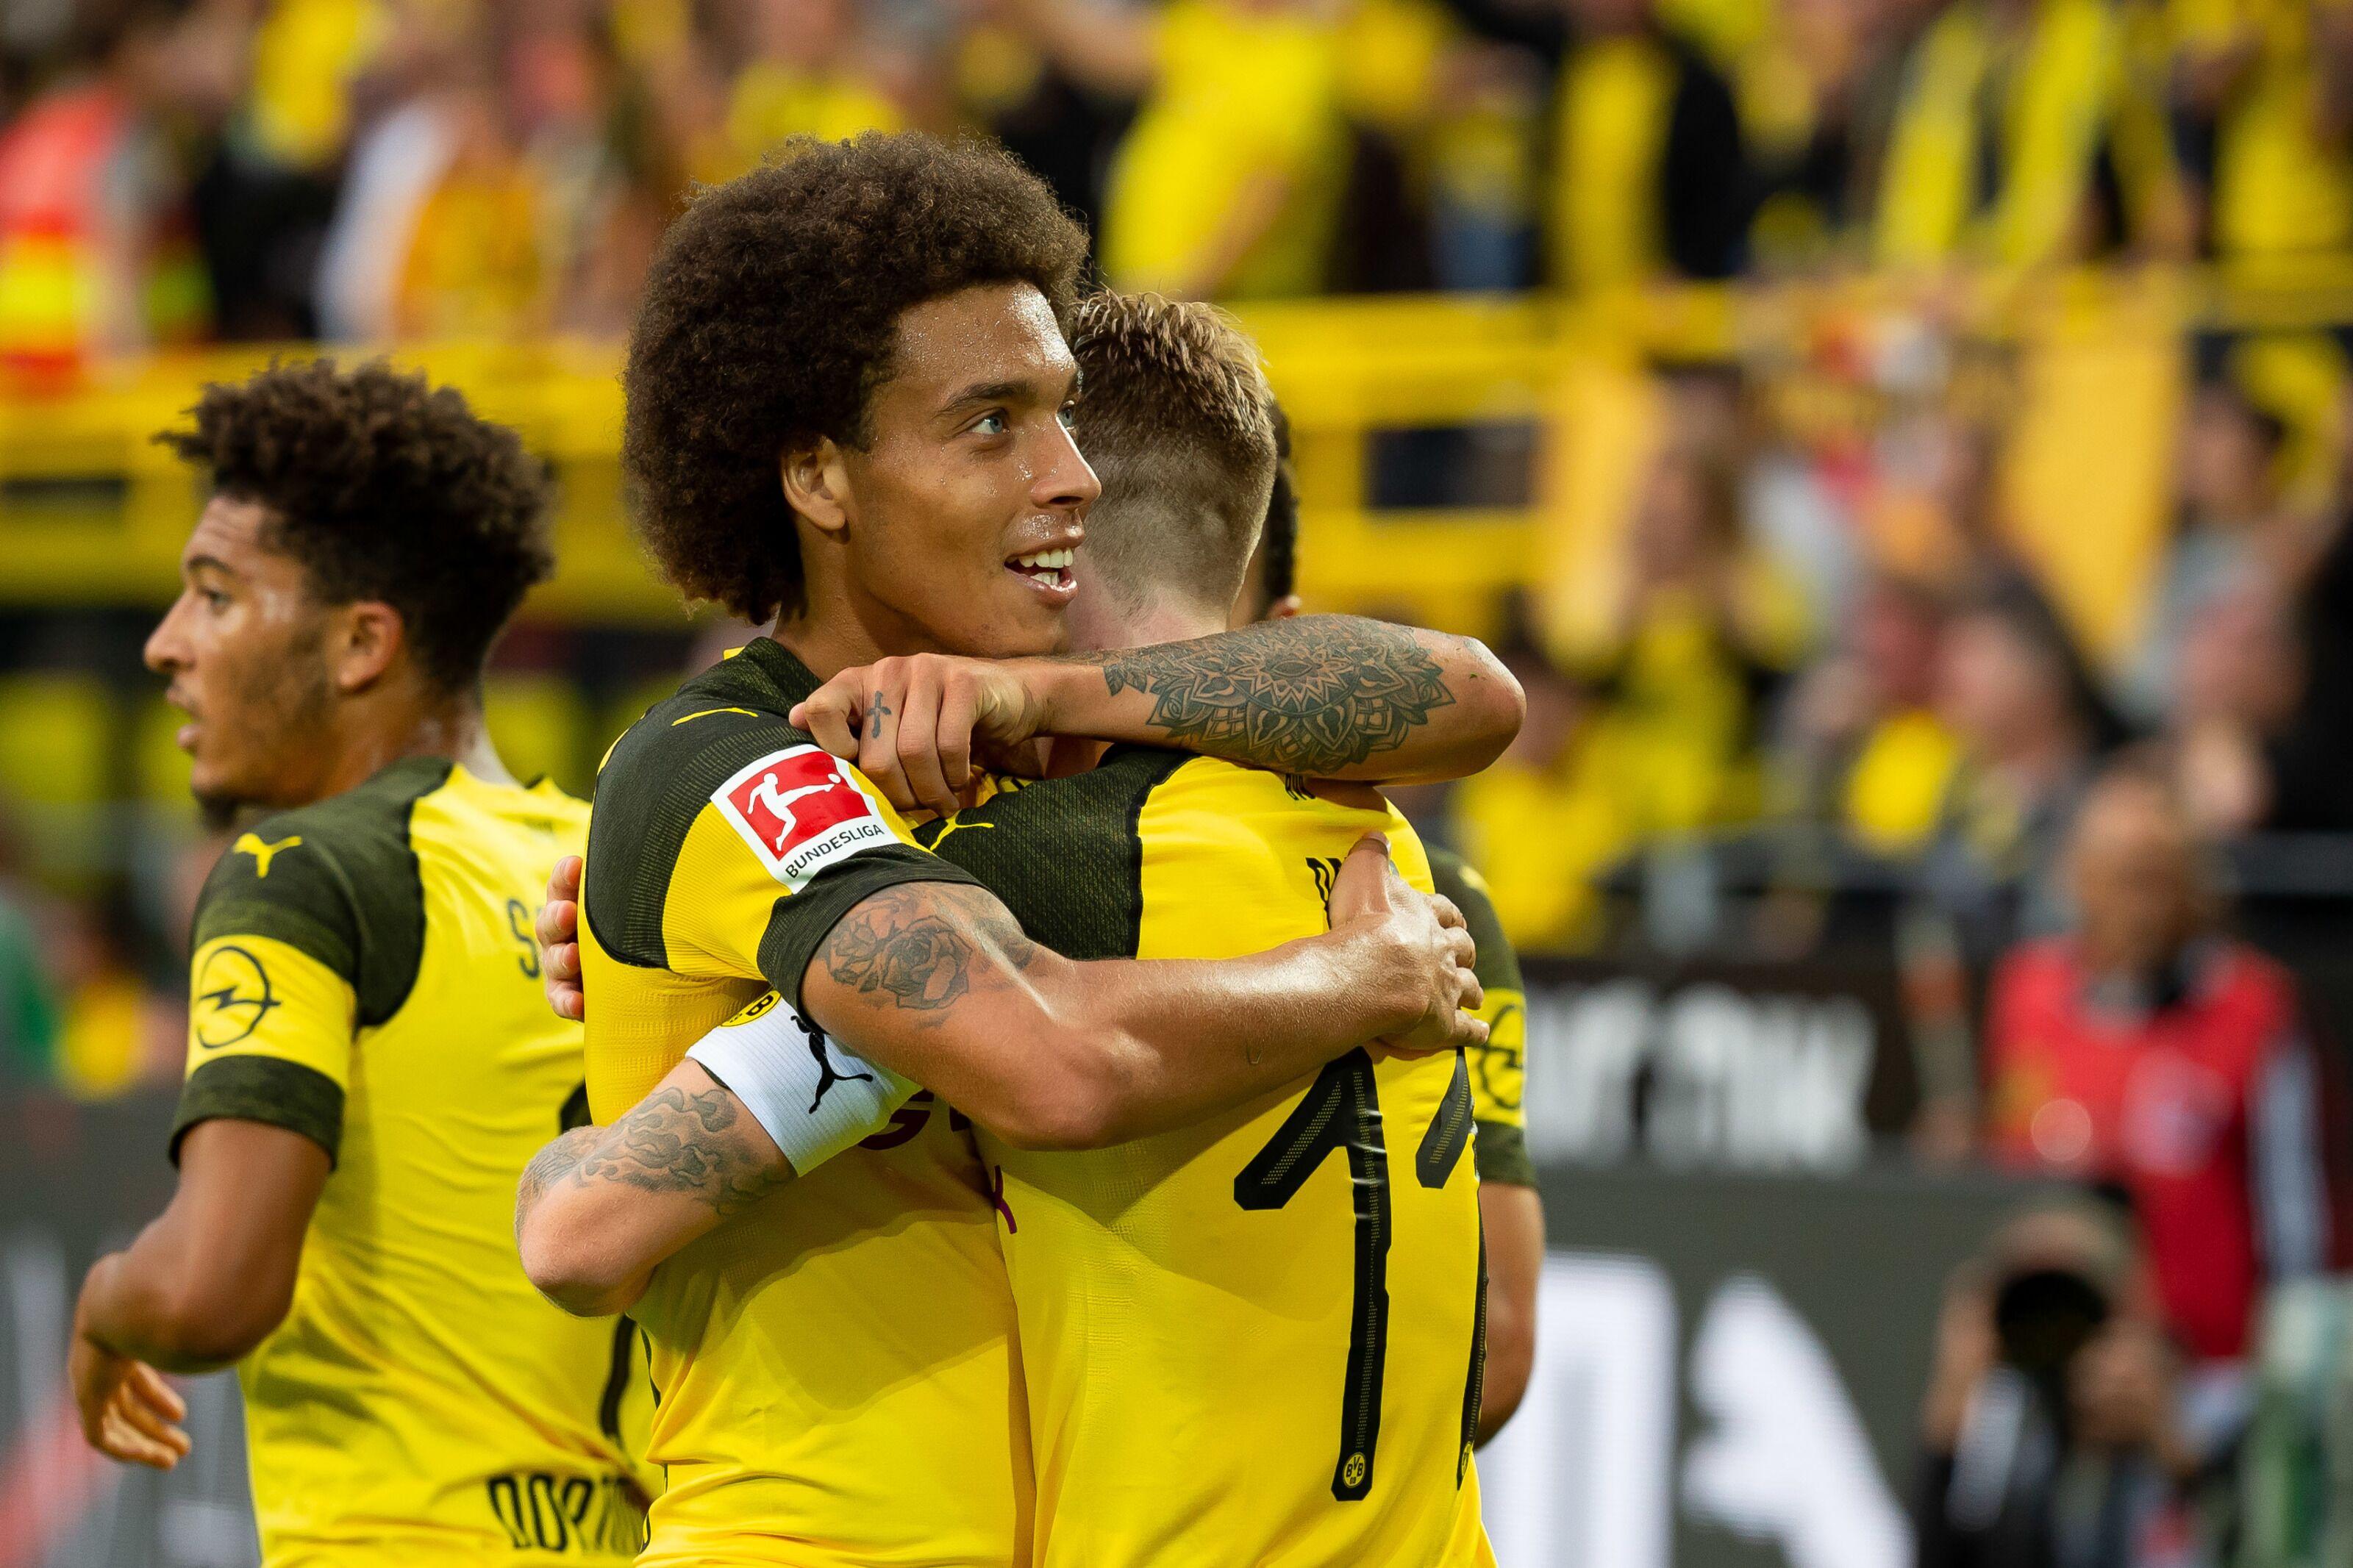 Dortmund Germany August 26 Marco Reus Of Borussia Dortmund Celebrates After Scoring His Teams Fourth Goal With Axel Witsel Of Borussia Dortmund During